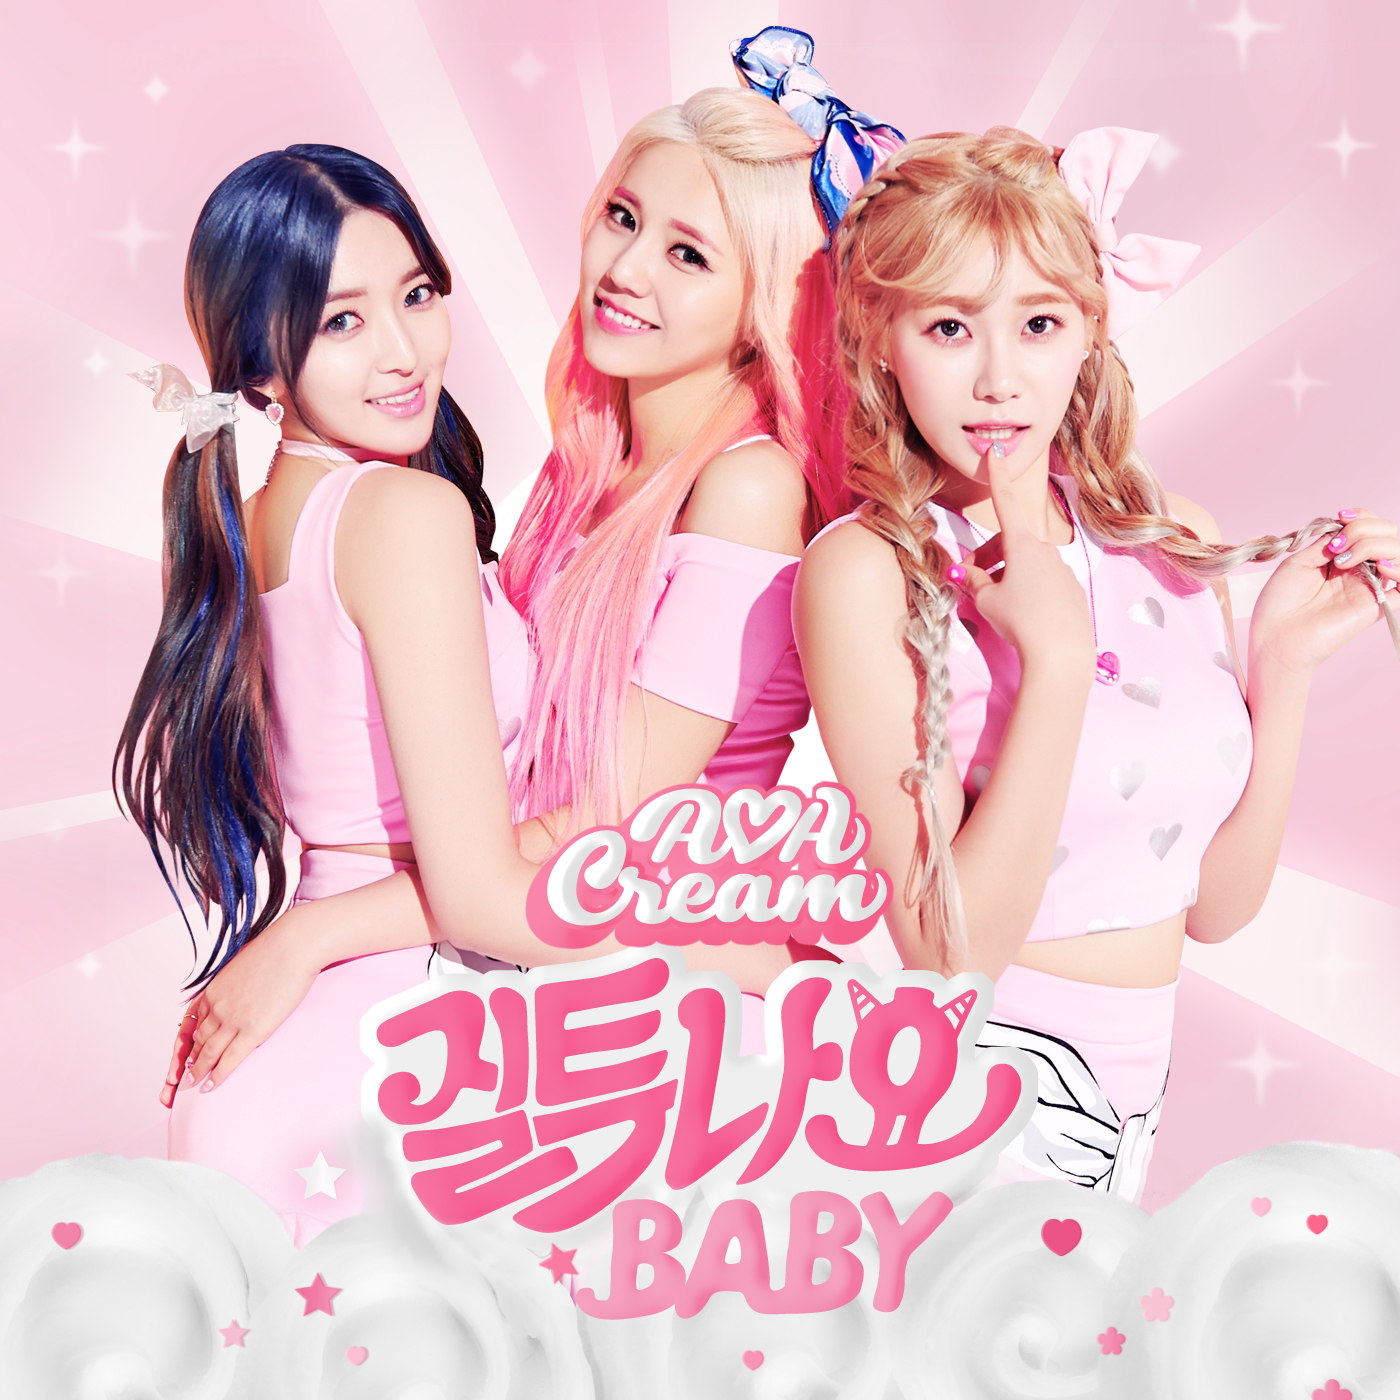 Color Coded Lyrics: I'm Jelly BABY (질투 나요 BABY) » Color Coded Lyrics